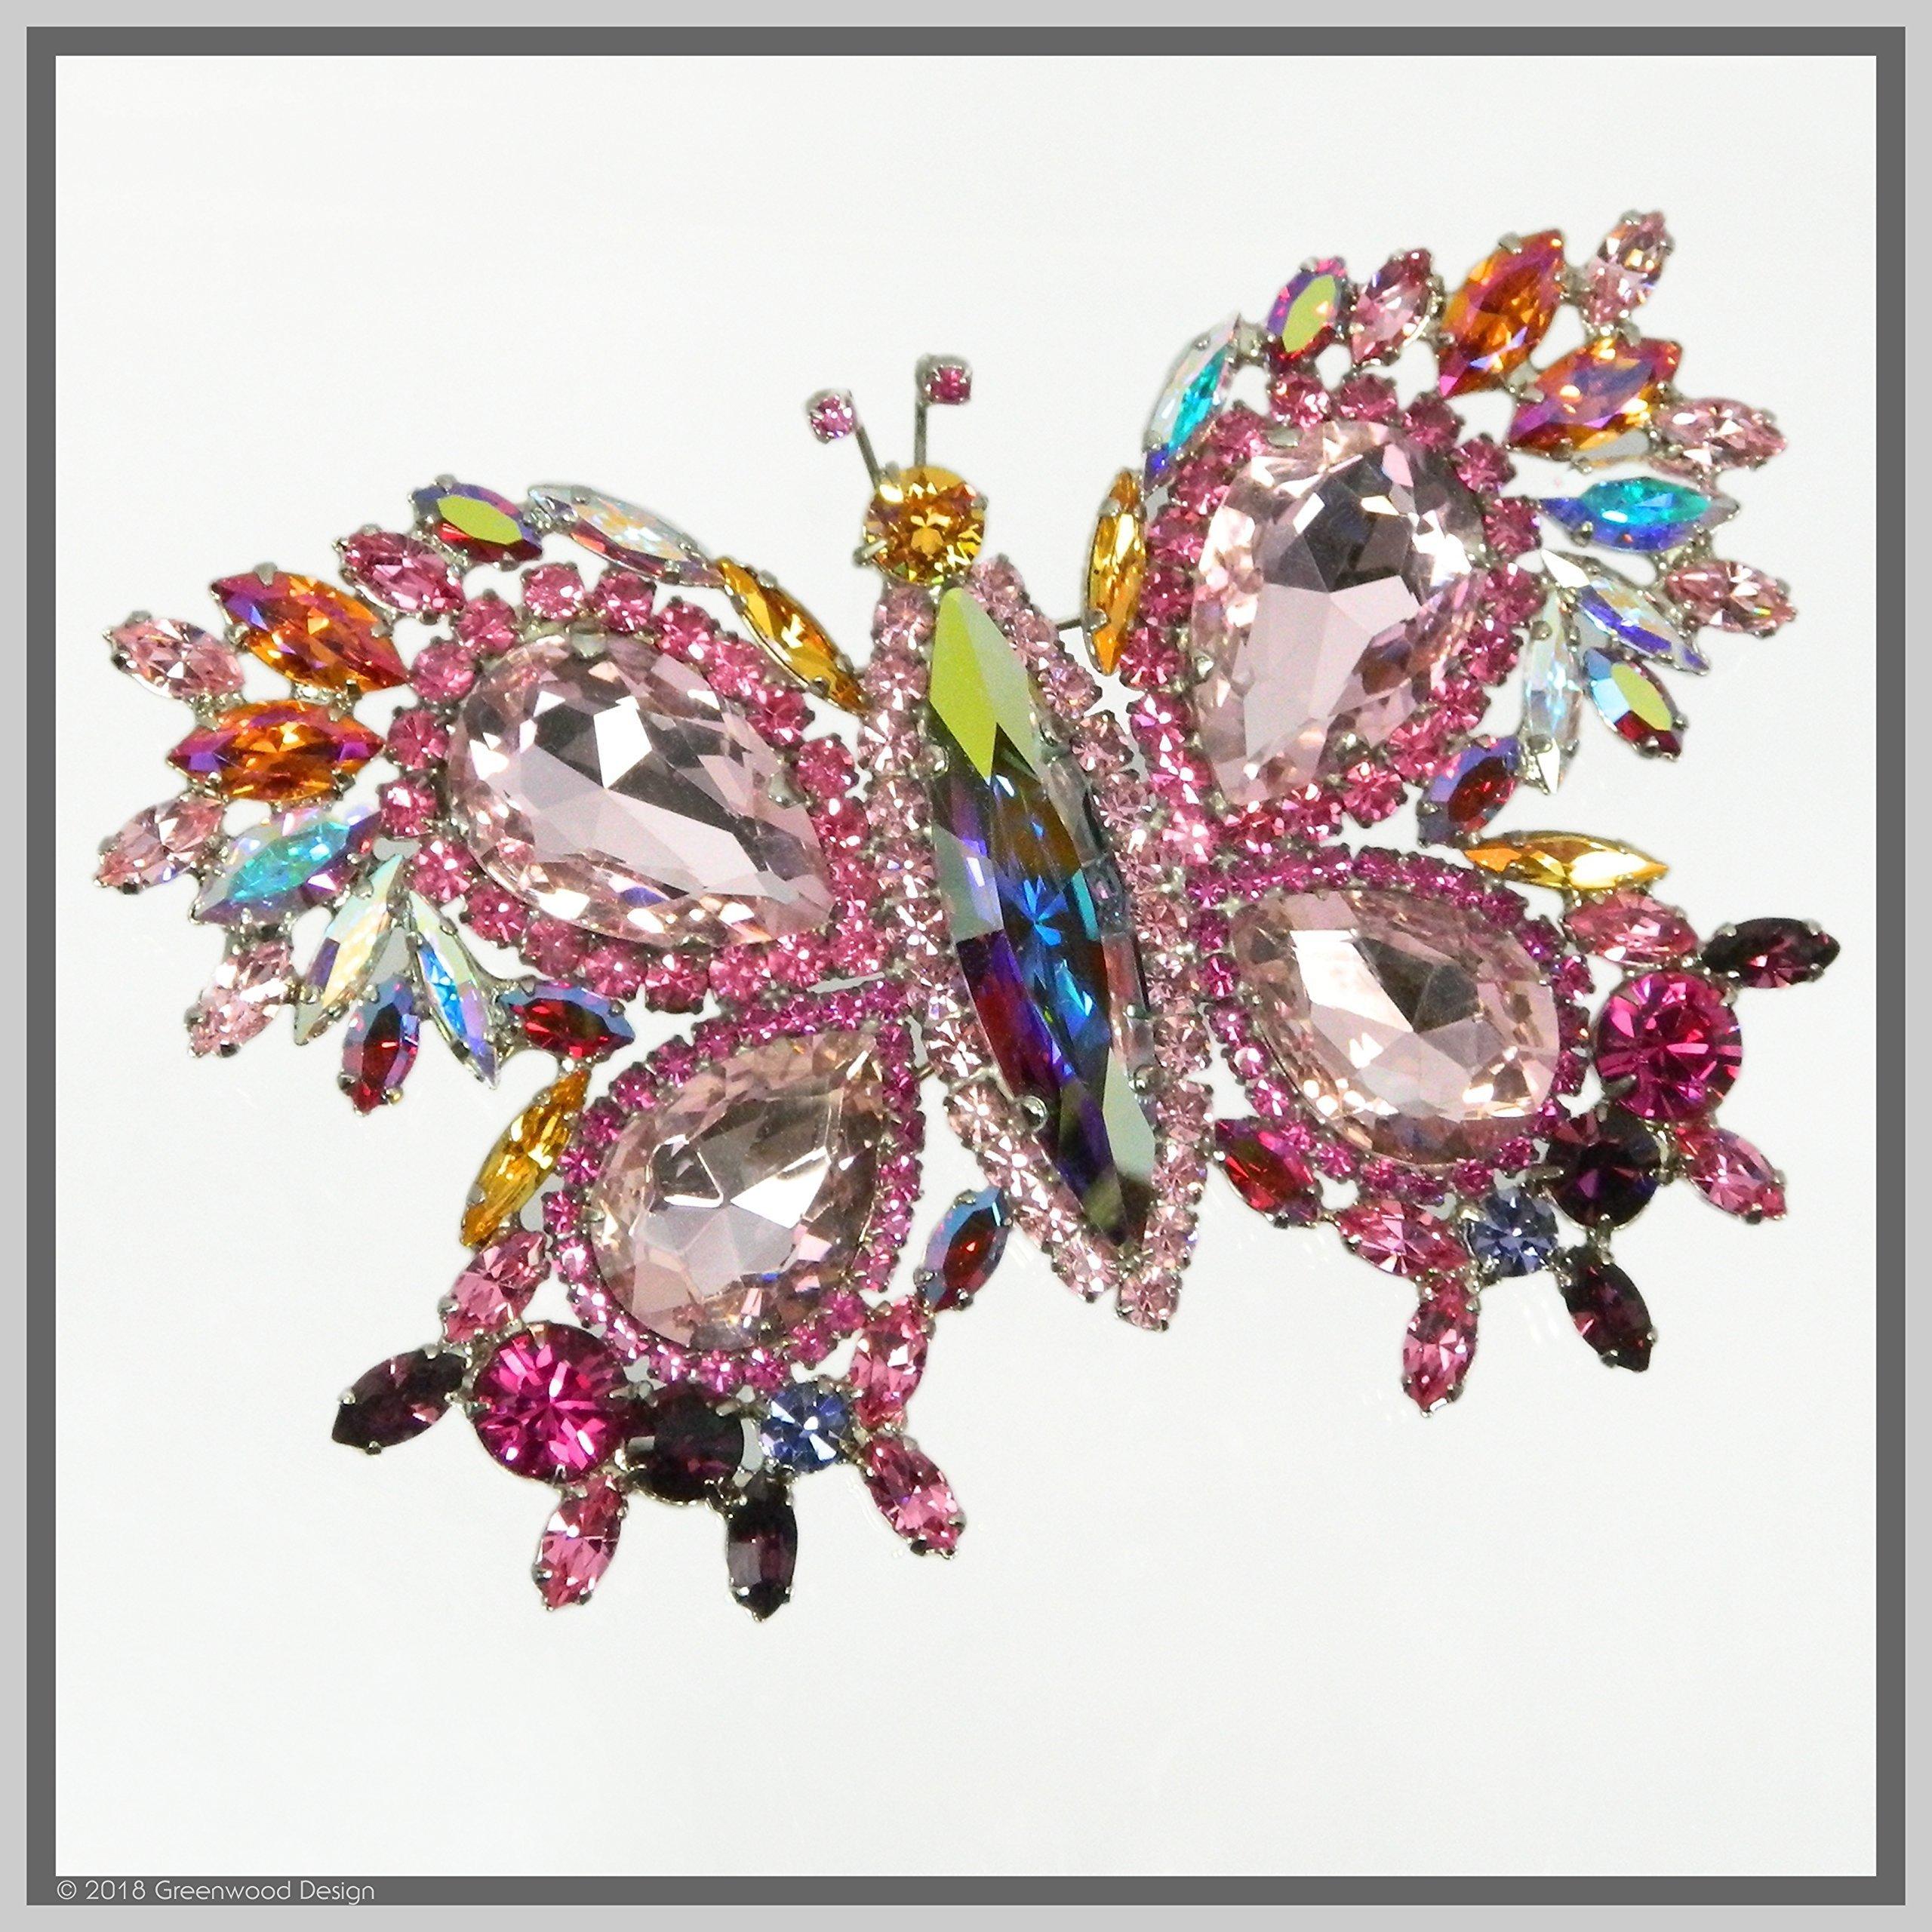 Handmade Jewelry Art Butterfly Brooch Pin Pink-Winged Swarovski Crystal Rhinestones